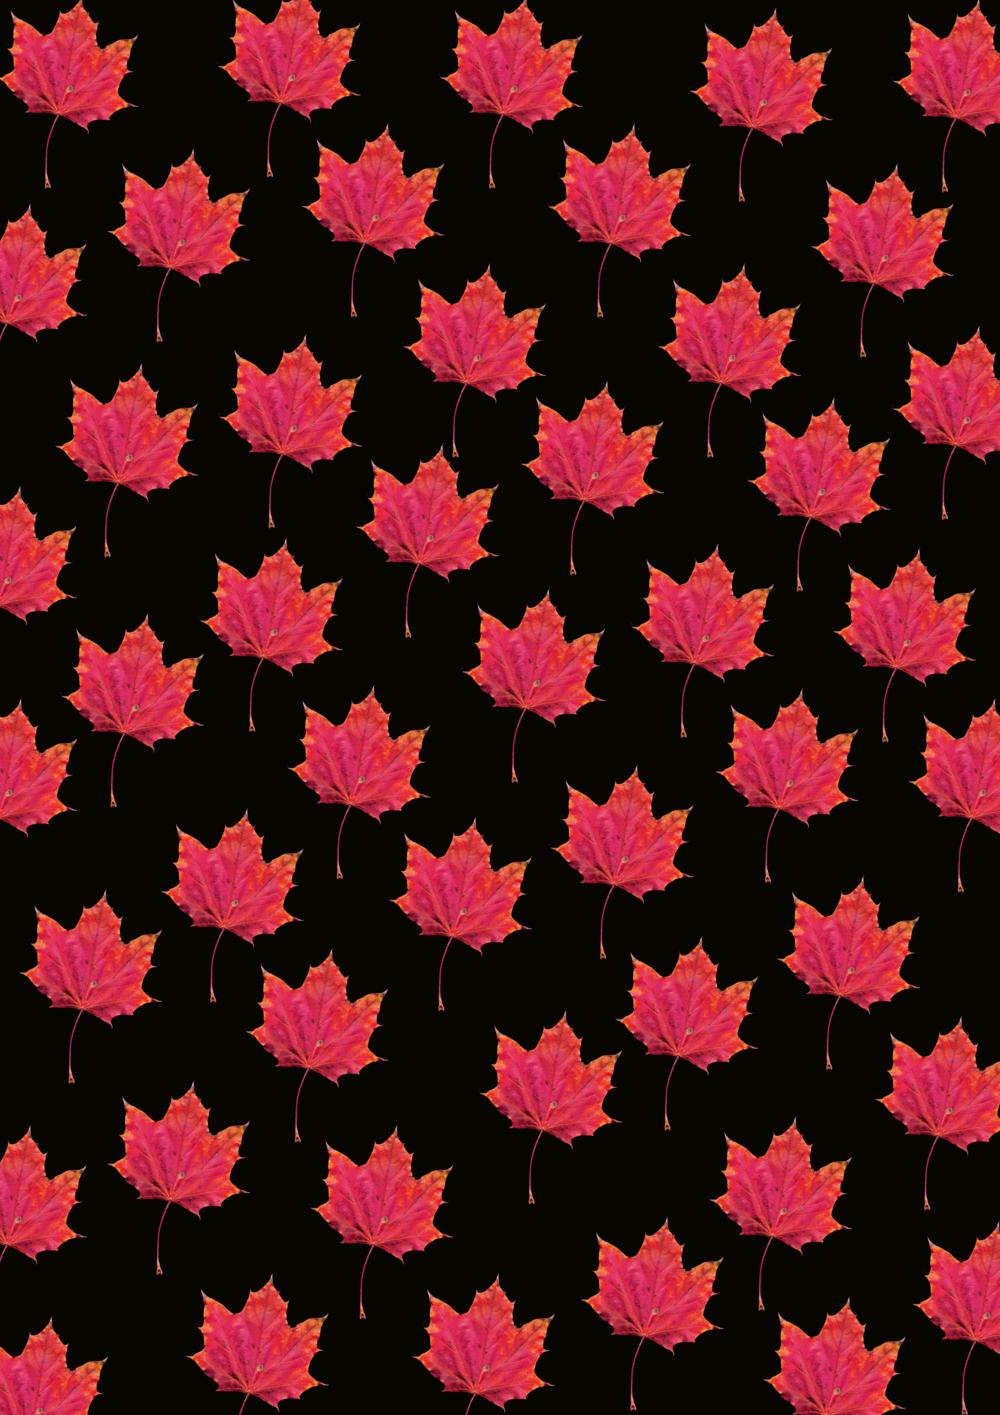 #fallpattern #patterndesign #phylleli #fallmood #graphicdesign #phonebackground #freelancer #botanicals